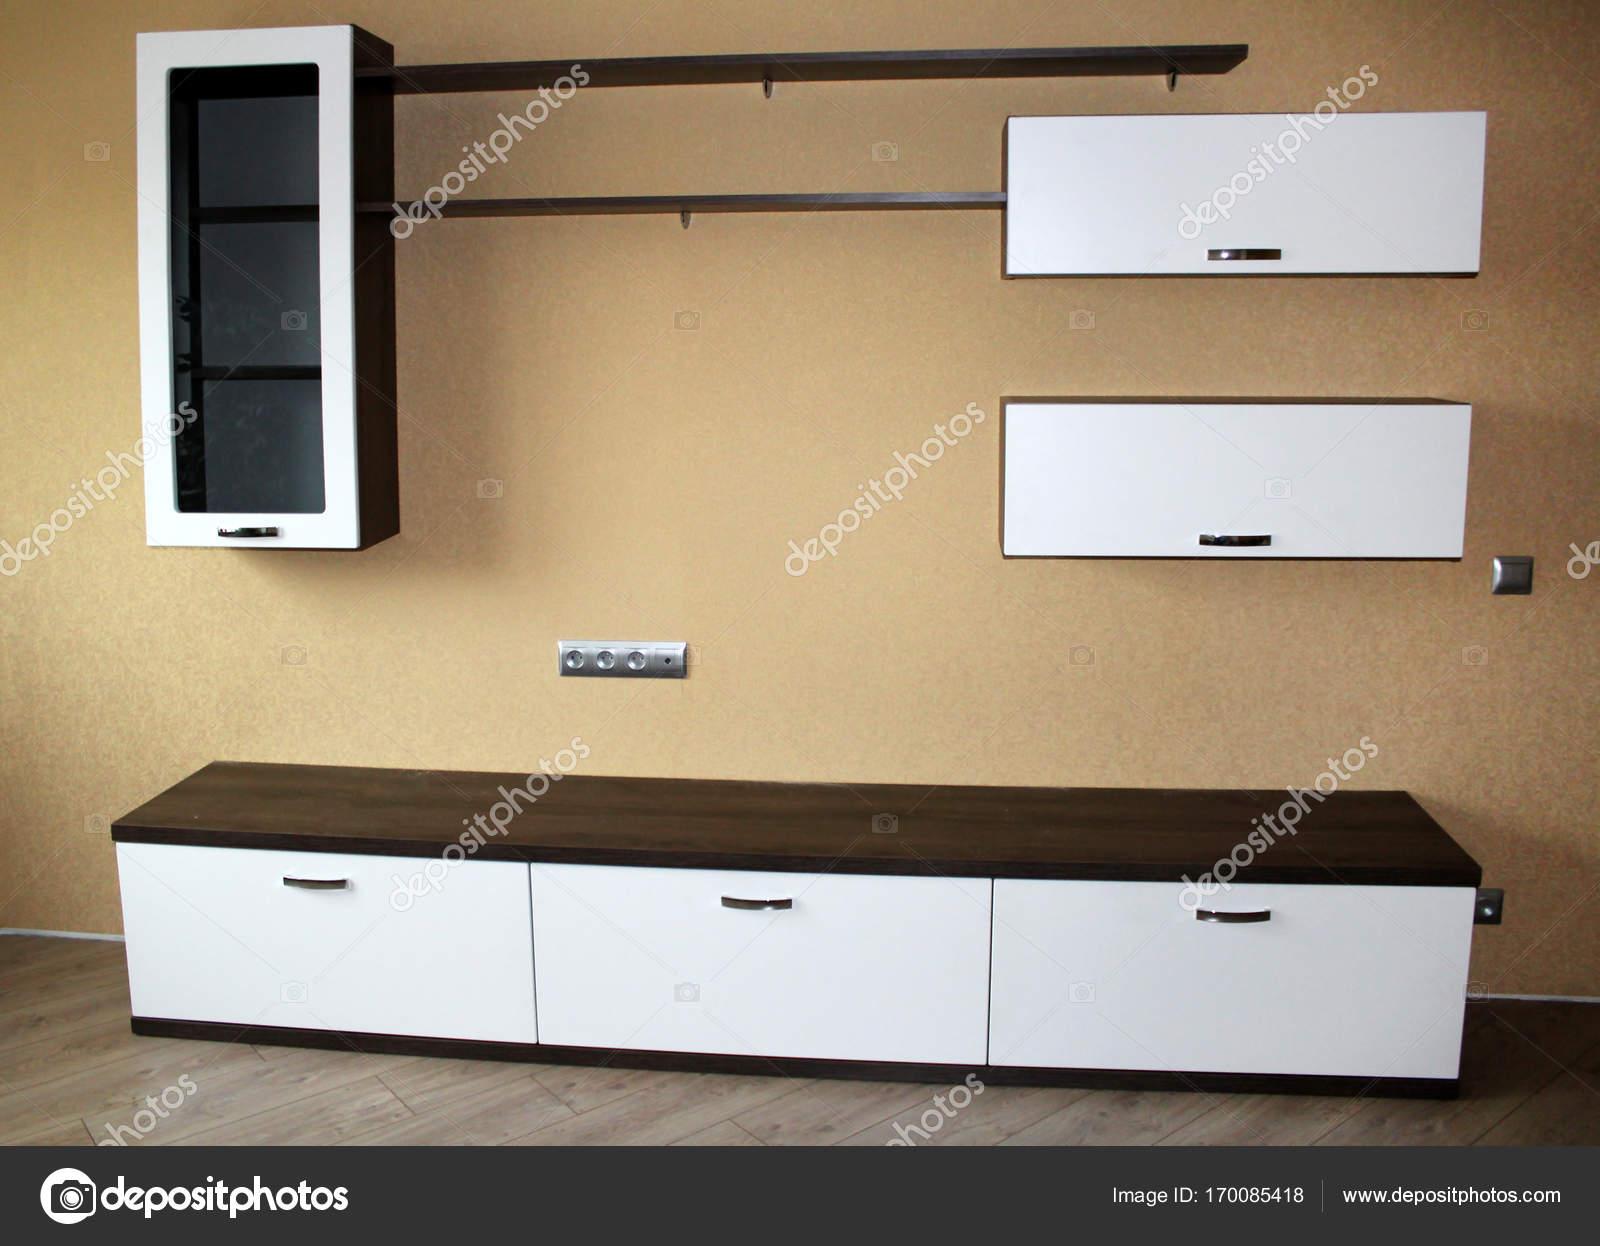 Woonkamer Houten Meubels : Houten meubels in de woonkamer interieur u stockfoto markasia